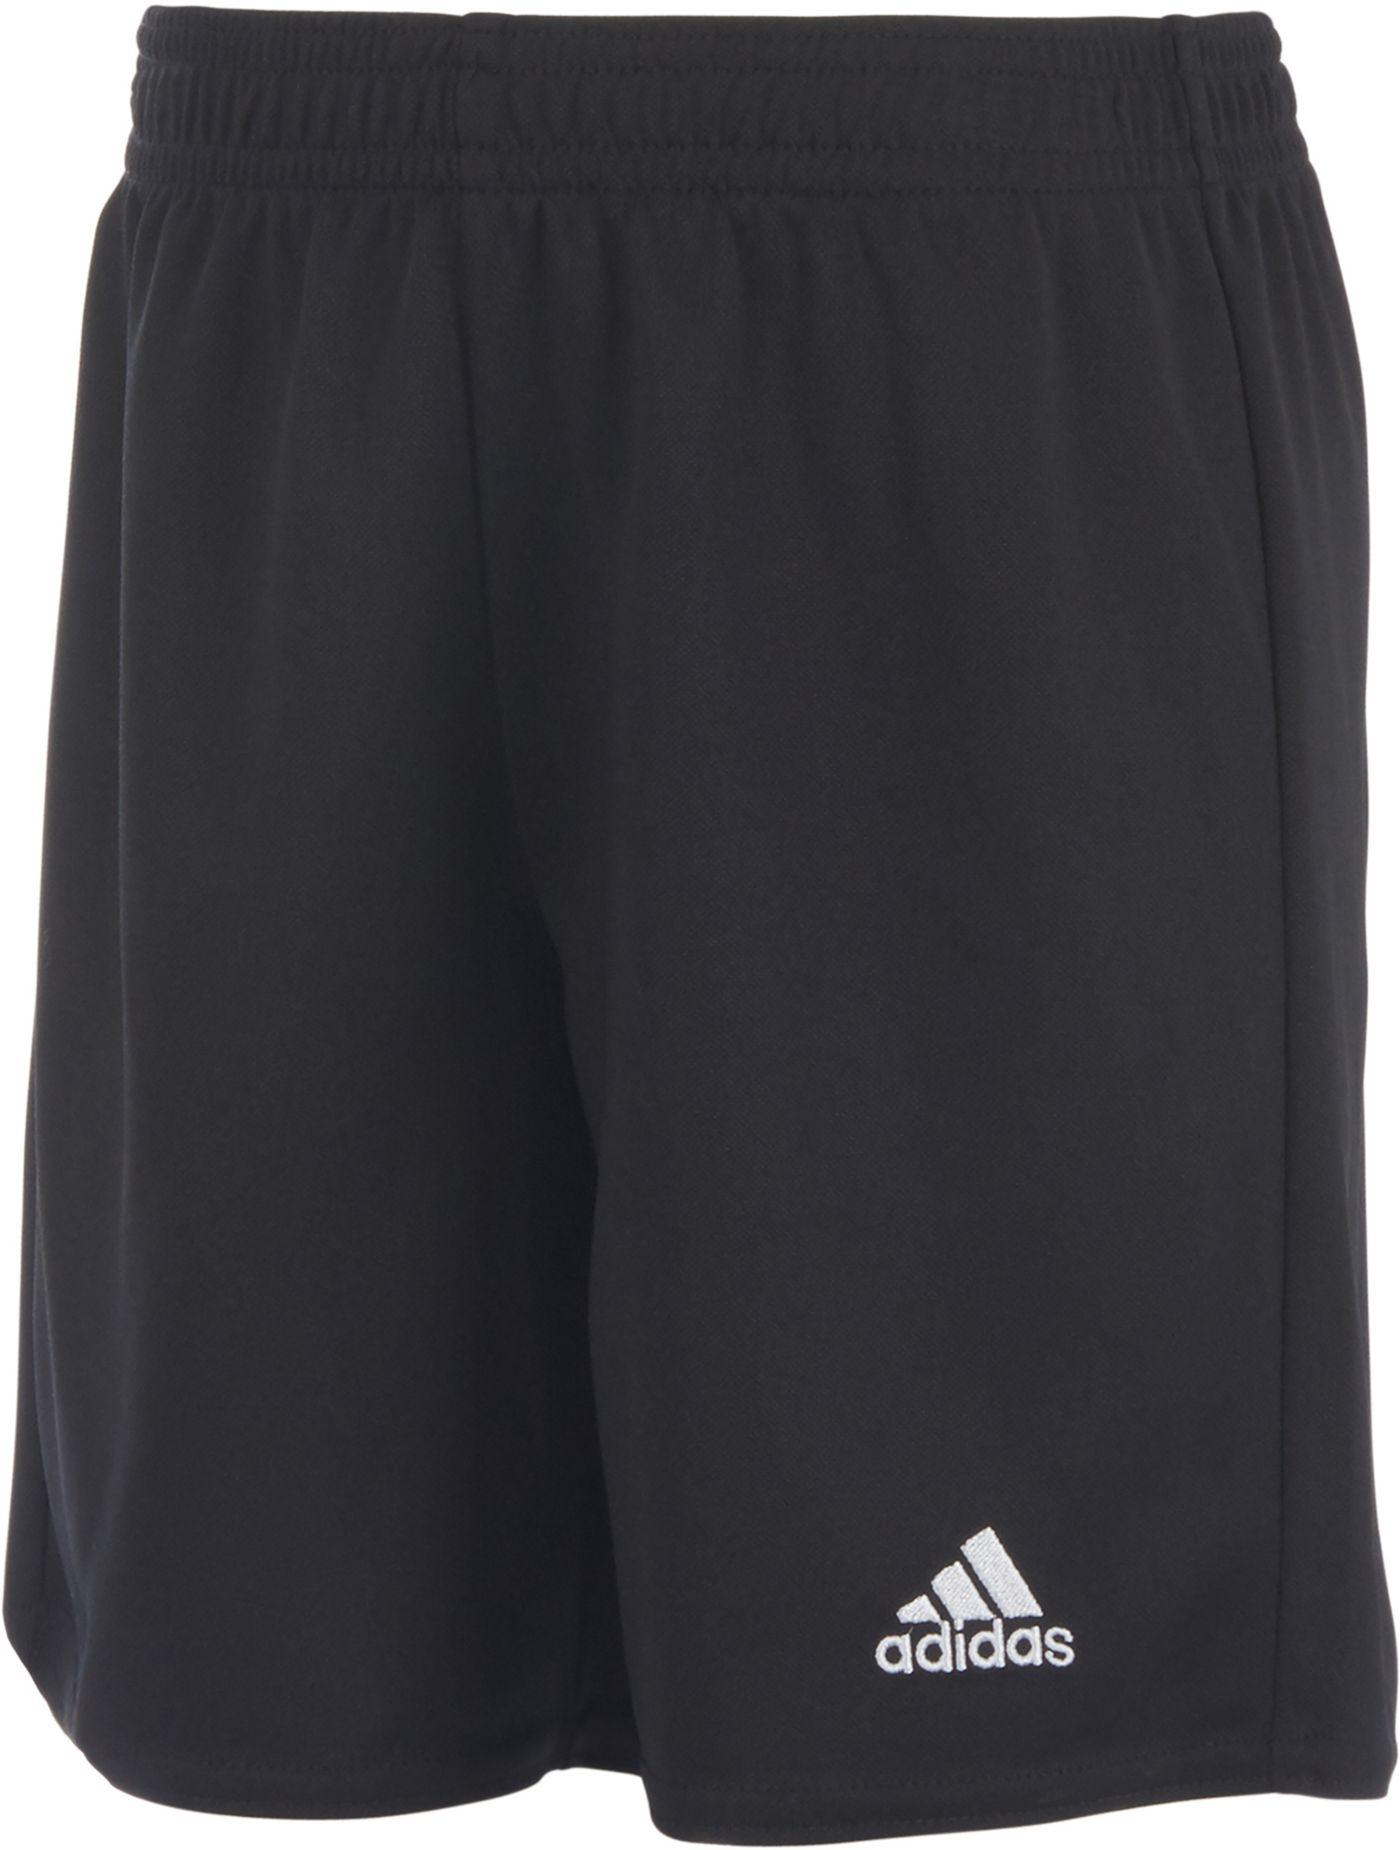 adidas Little Boys' Parma Shorts